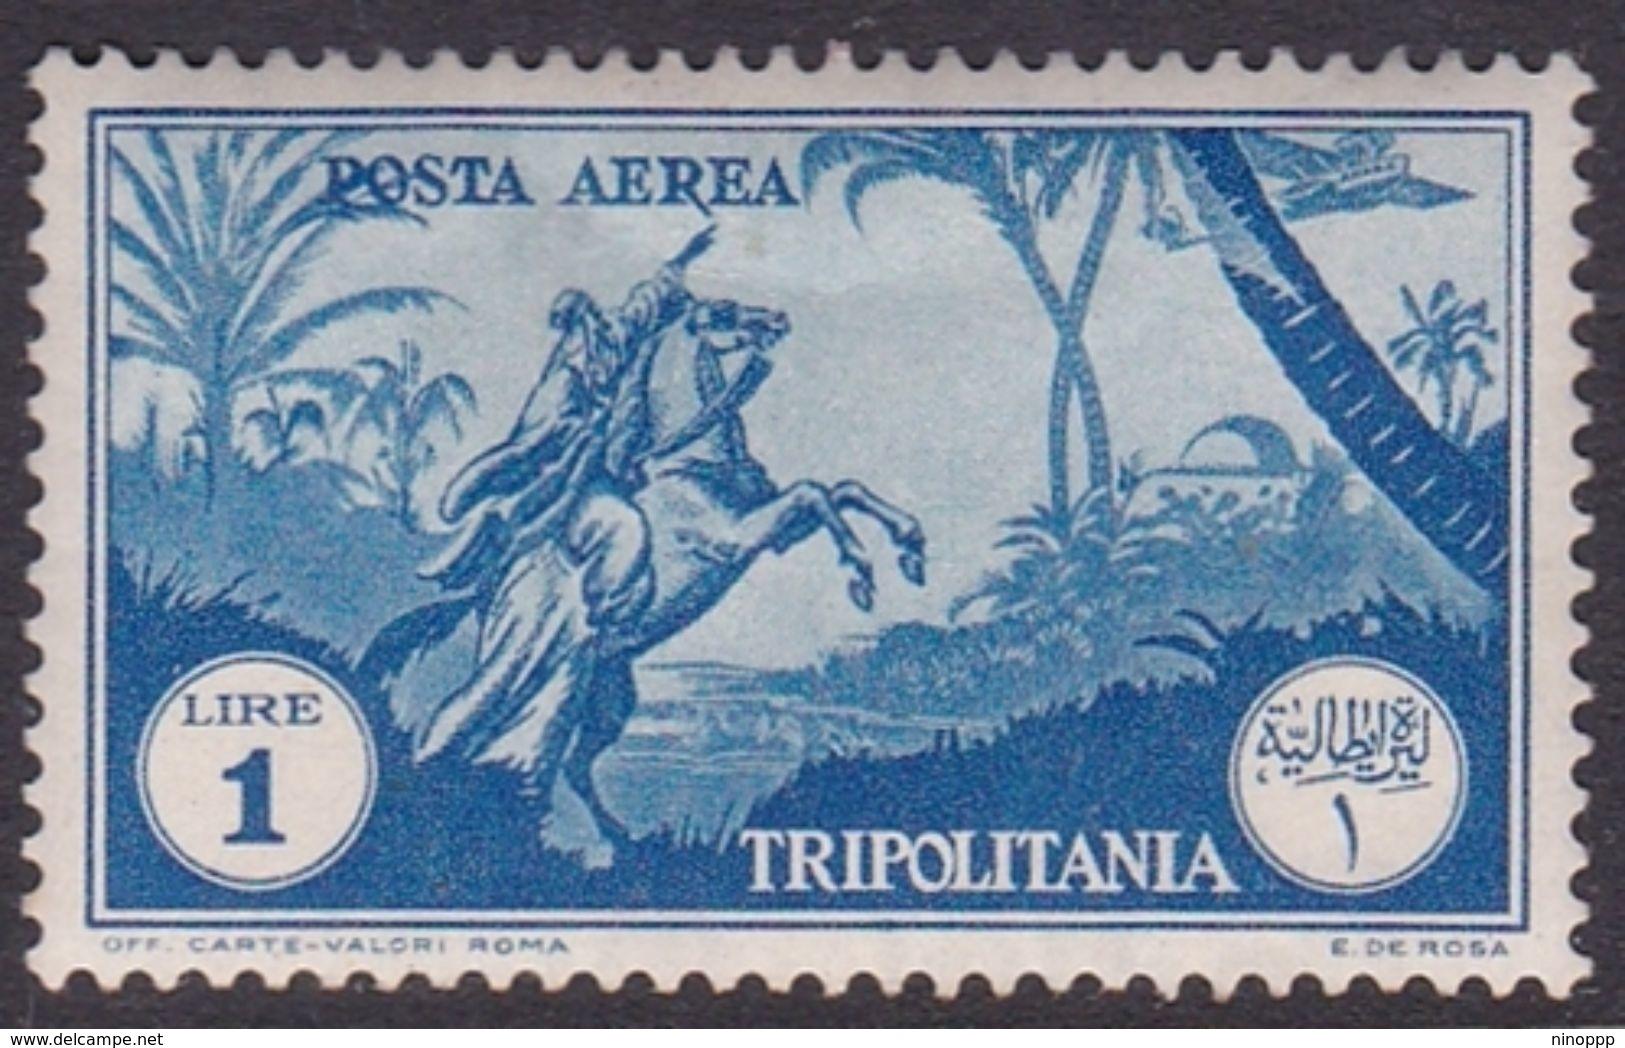 Italy-Colonies And Territories-Tripolitania A13  1931 Air Horseman, 1 Lira Blue Mint Hinged - Tripolitania